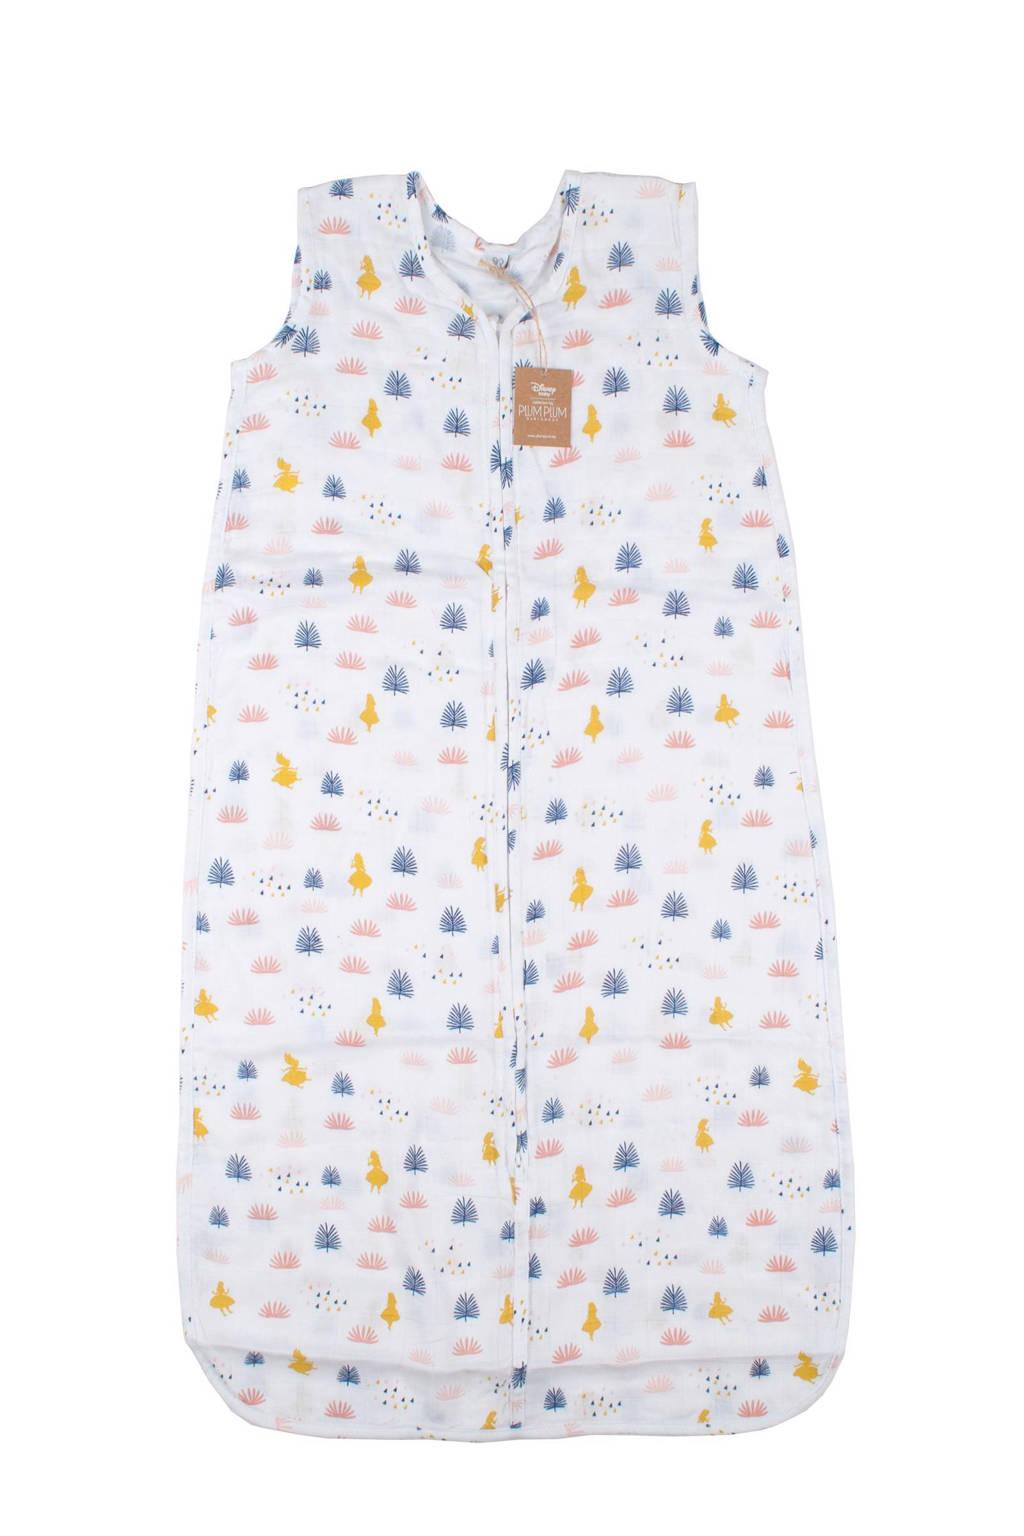 PlumPlum Disney Baby Alice baby slaapzak zomer hydrofiel 90 cm